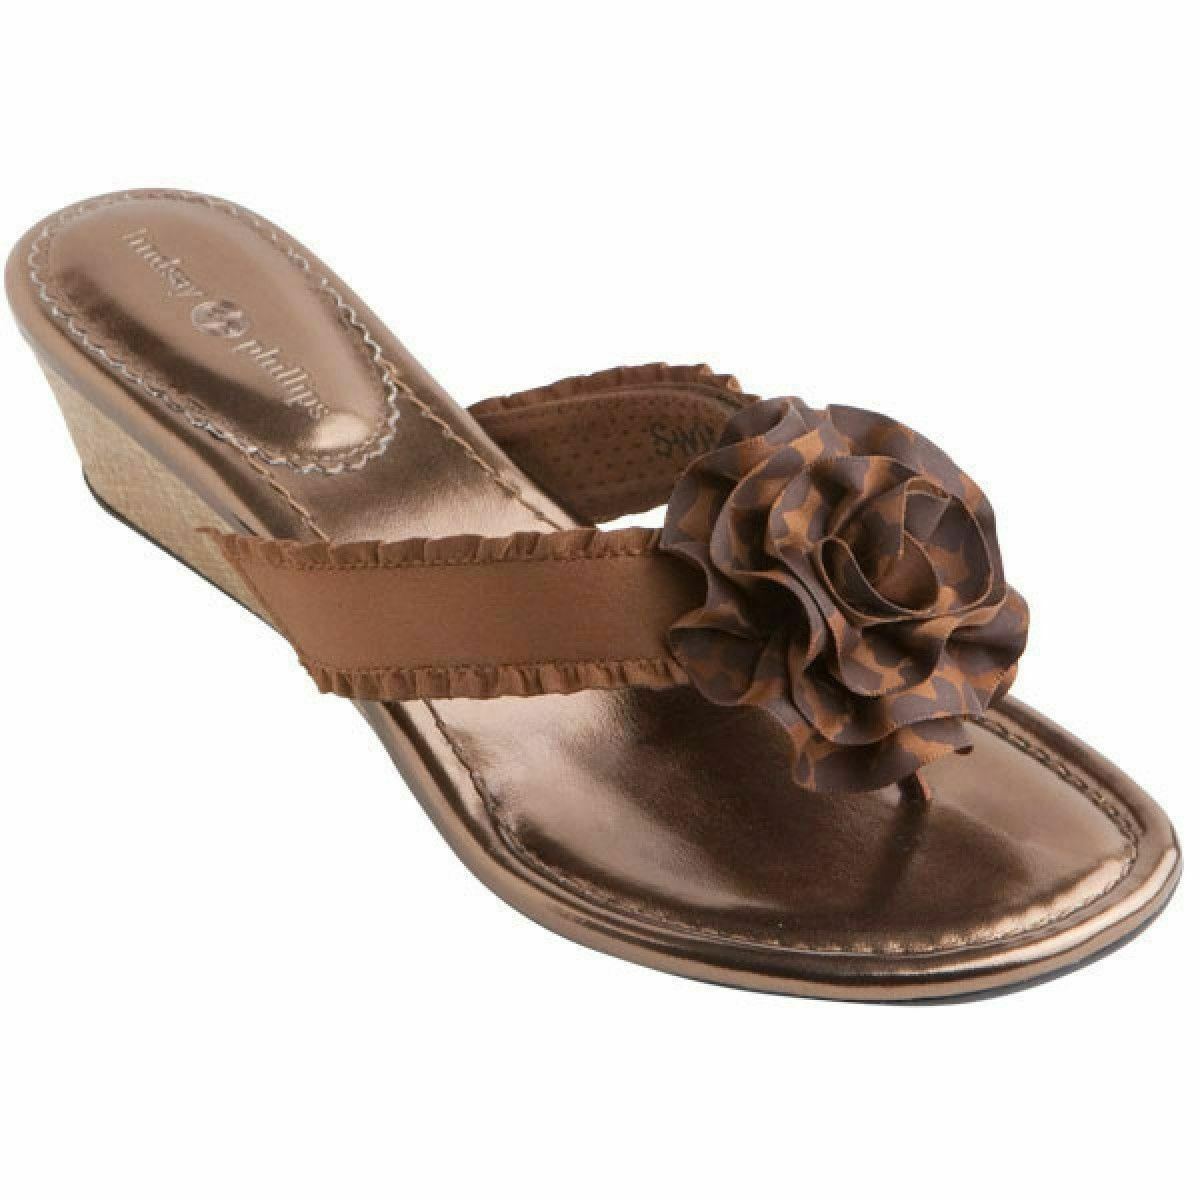 NEW Lindsay Phillips Missy Bronze size 7 switchflop sandal very pretty